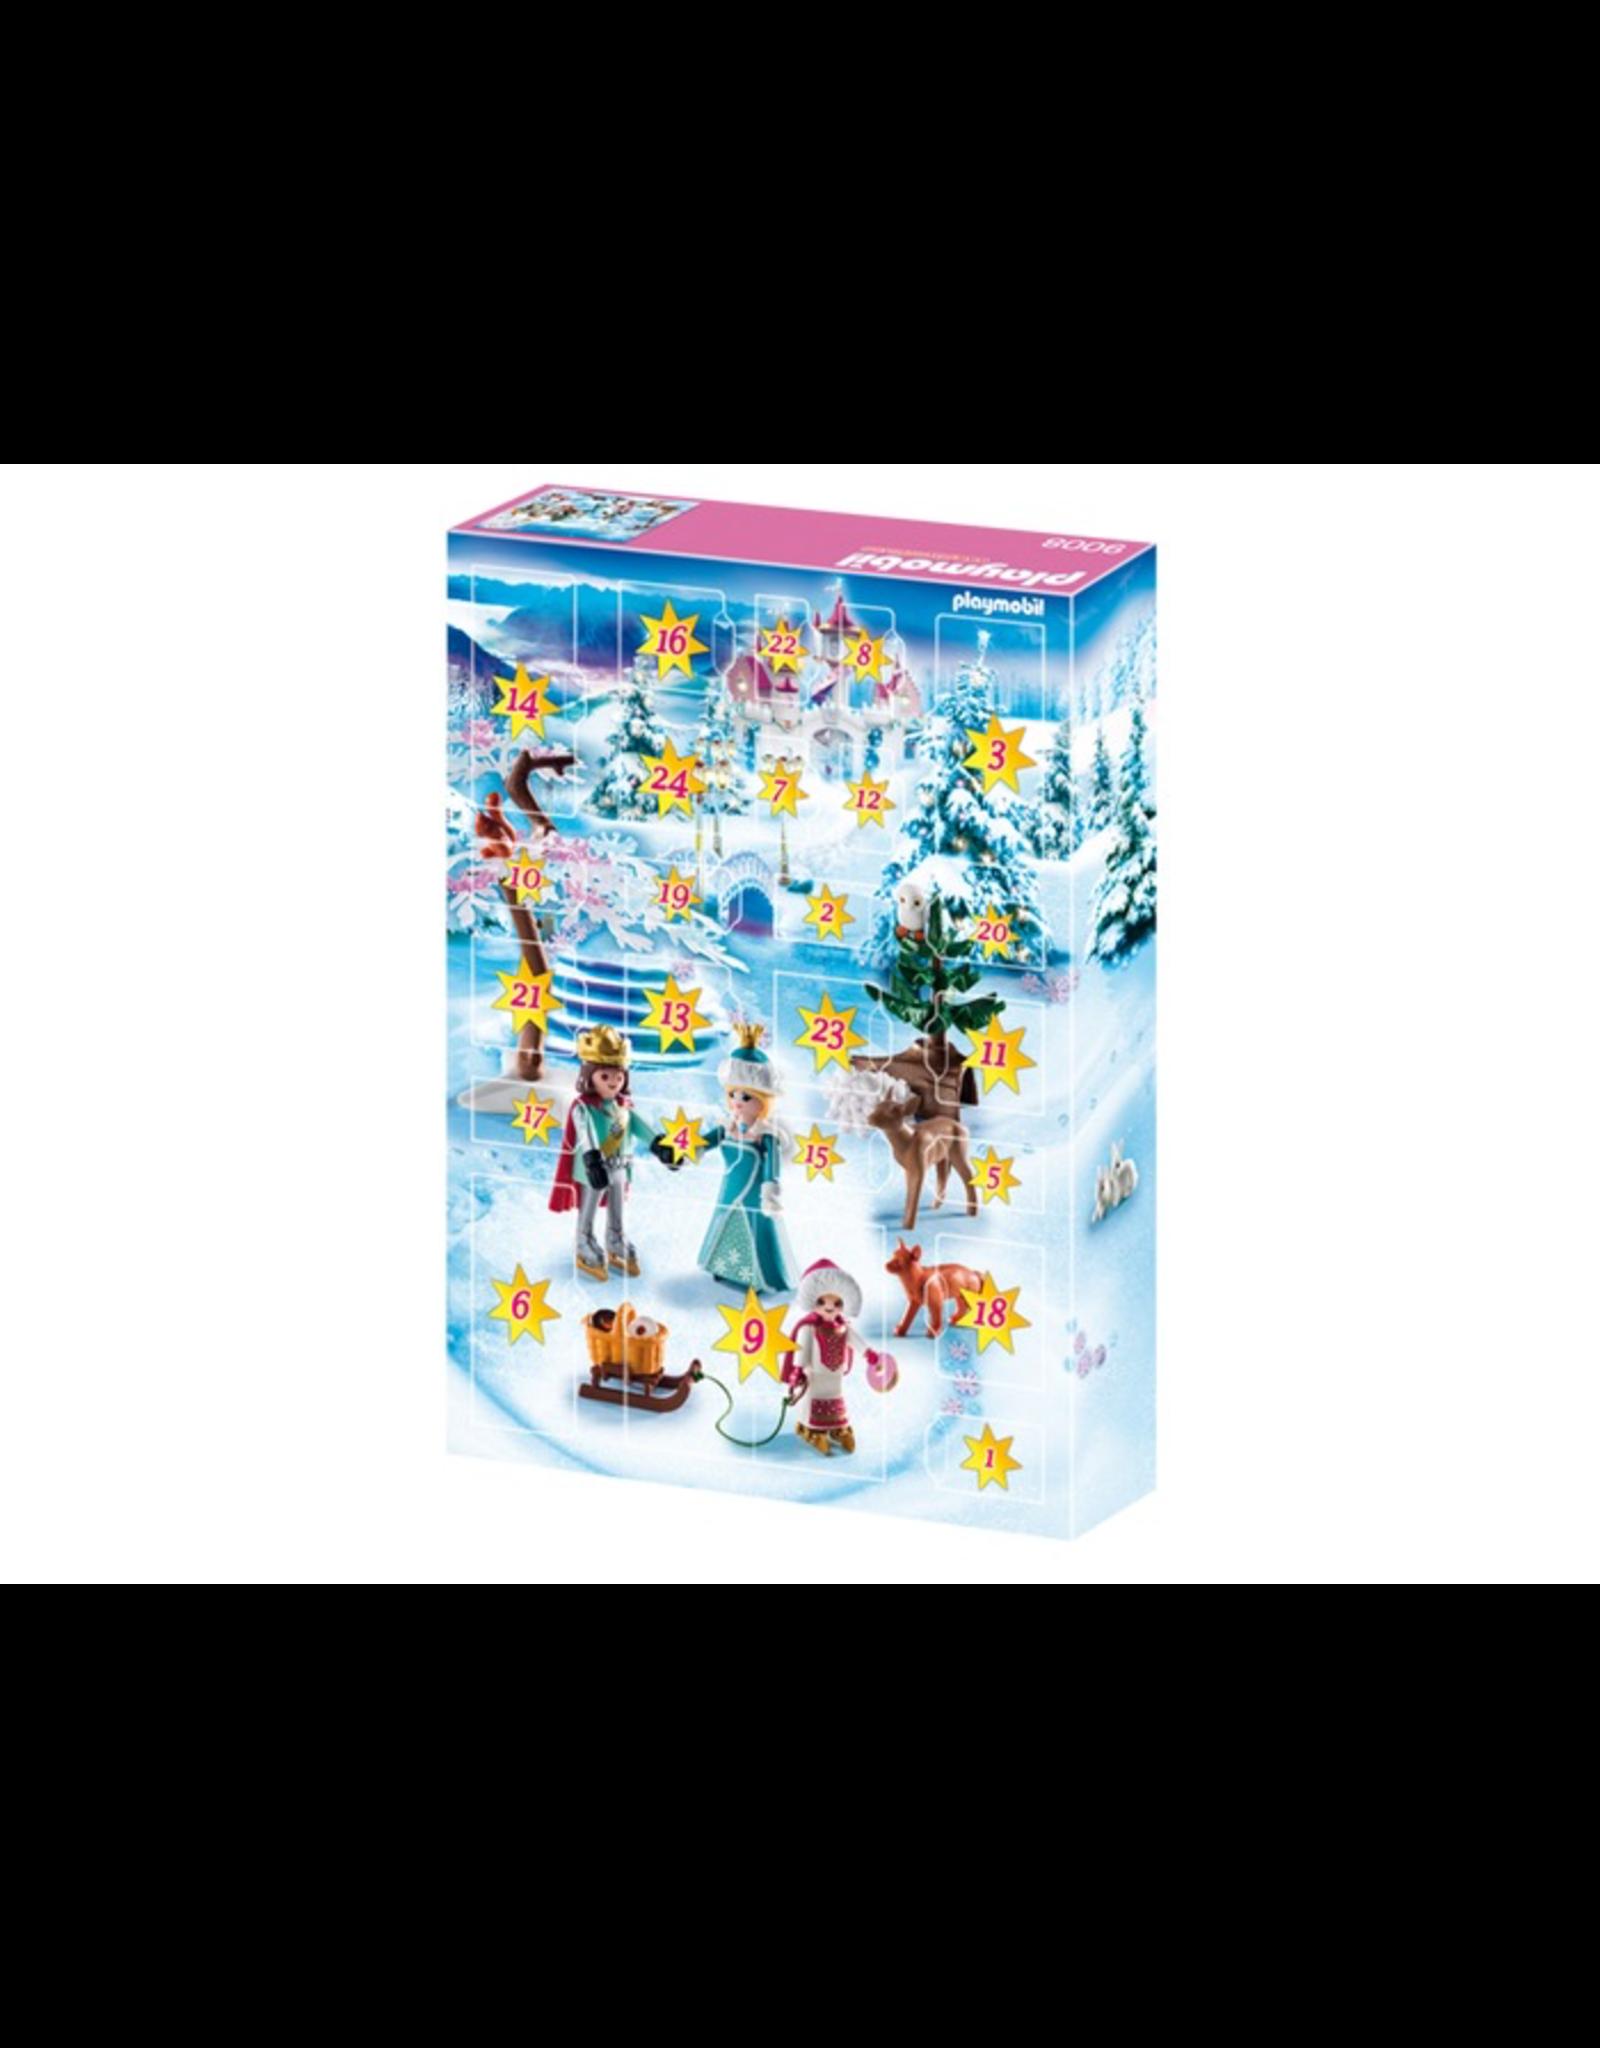 Playmobil 9008 ADVENT CALENDAR - ROYAL ICE SKATING